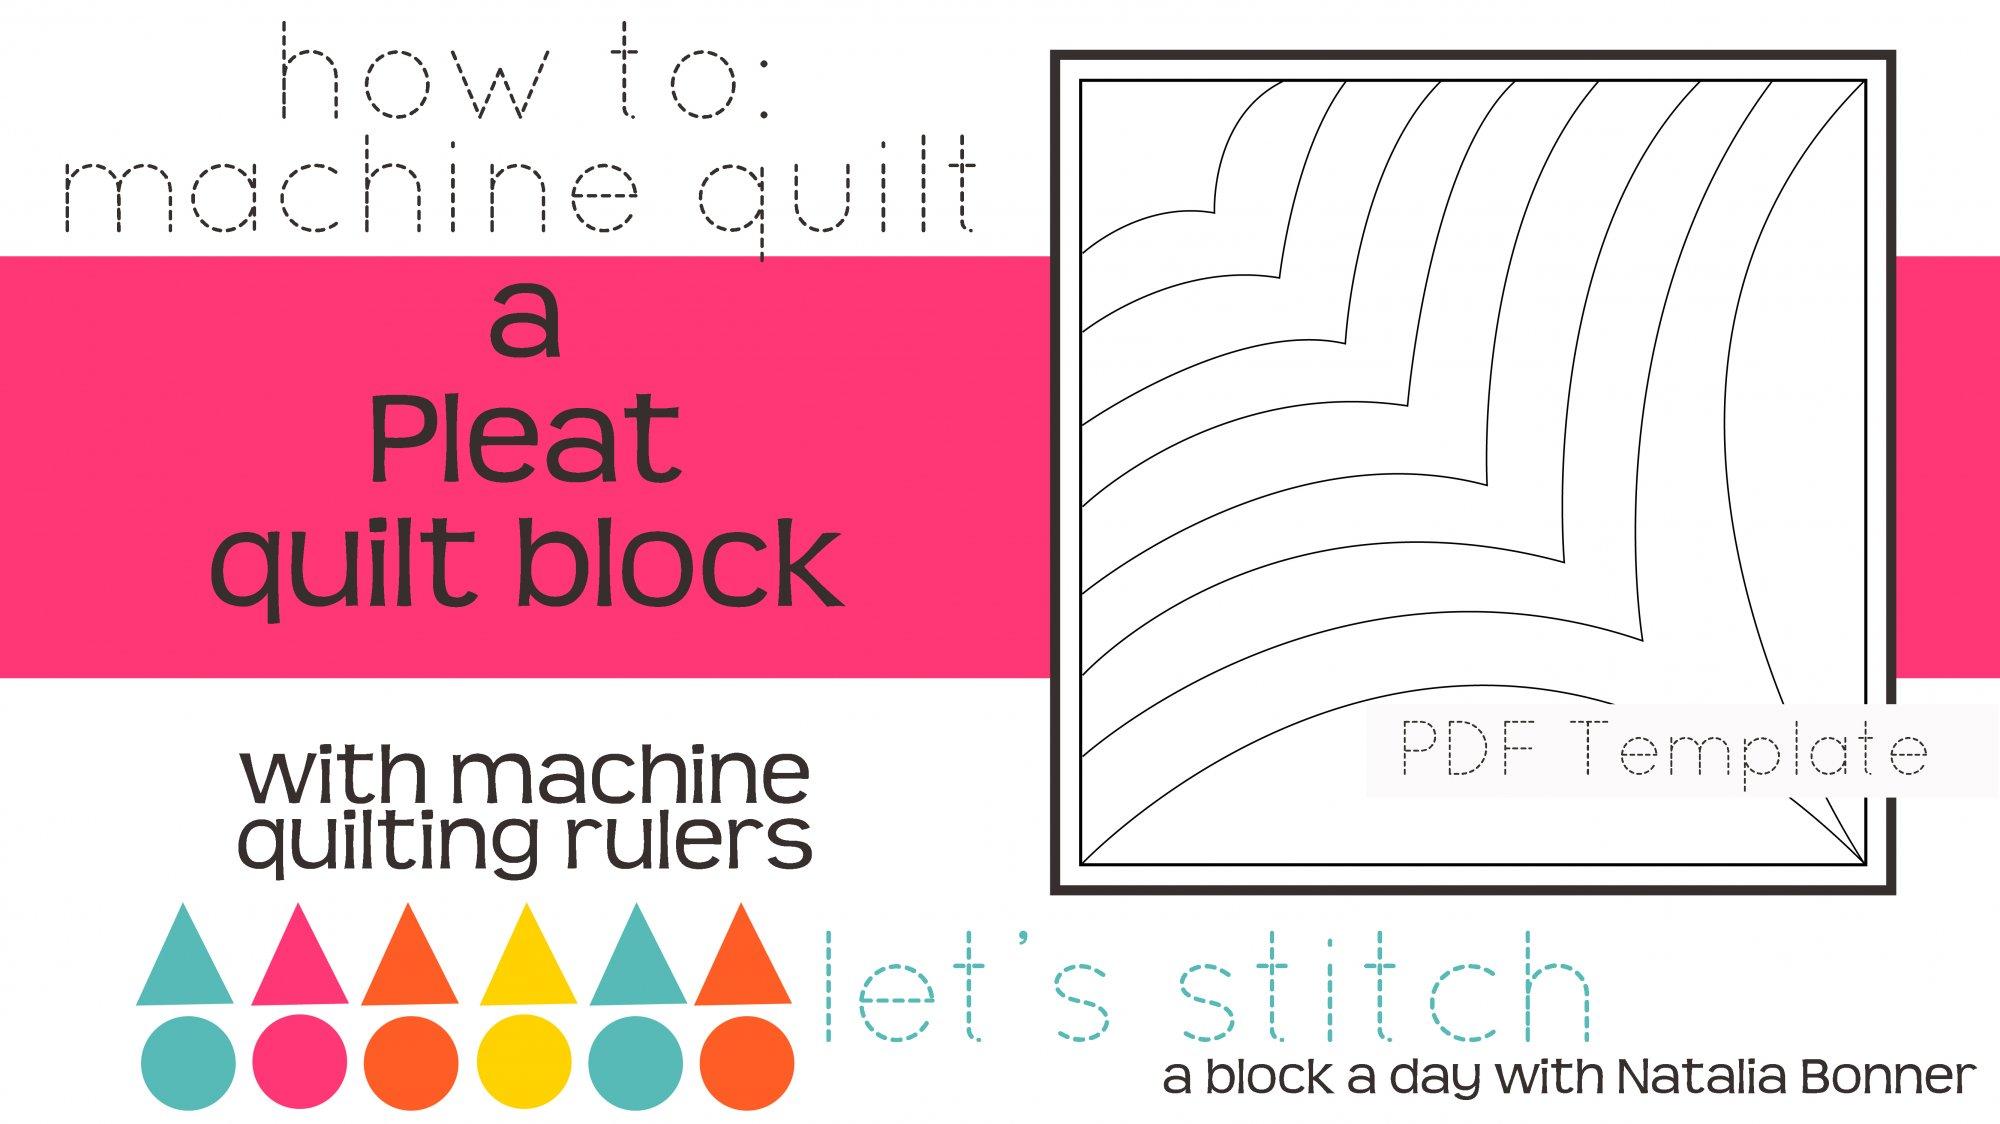 Let's Stitch - A Block a Day With Natalia Bonner - PDF - Pleat